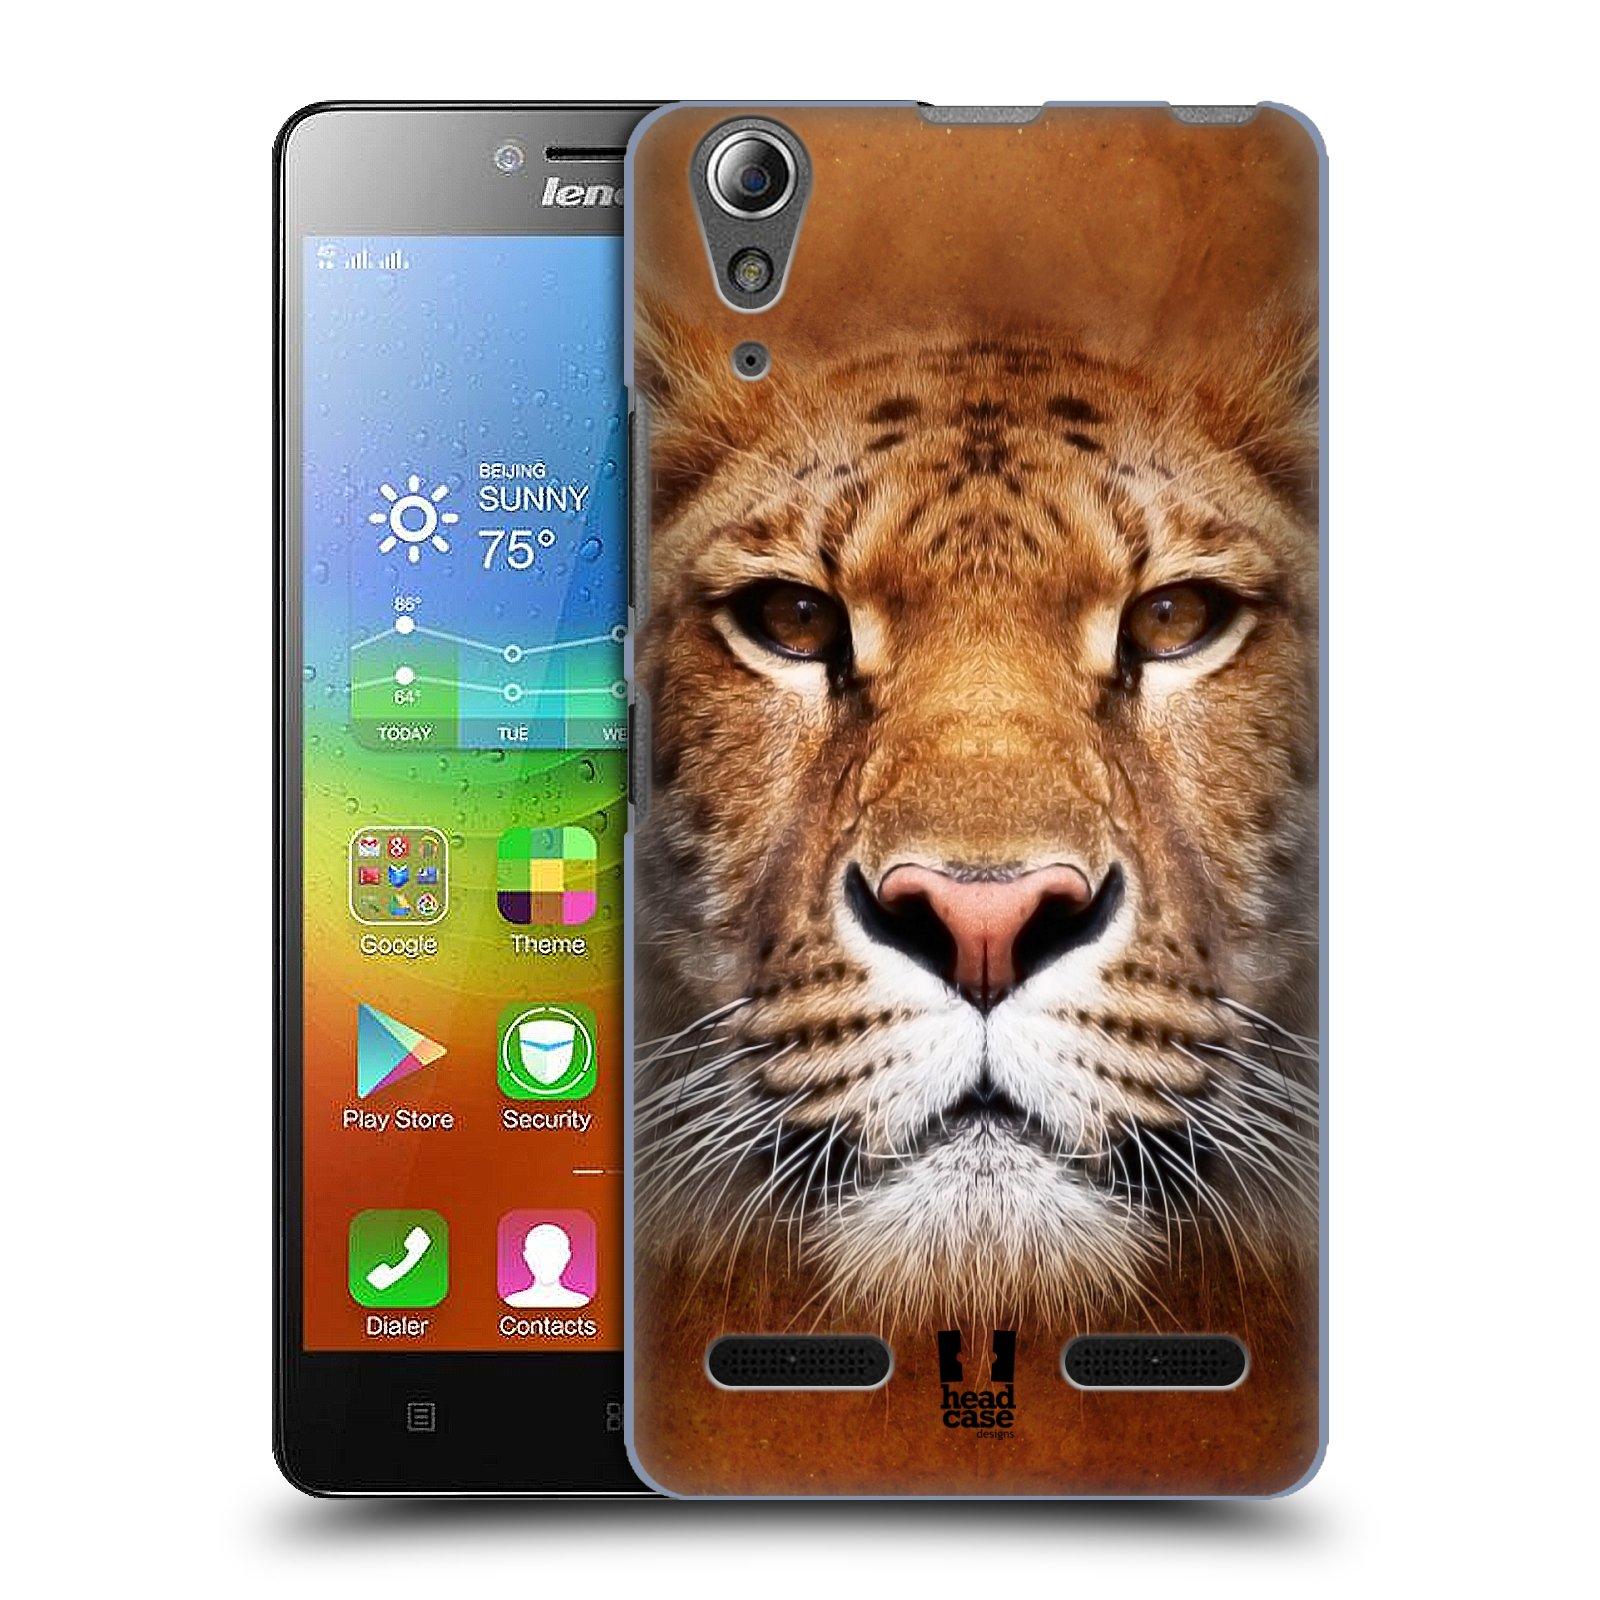 HEAD CASE pevný plastový obal na mobil LENOVO A6000 / A6000 PLUS vzor Zvířecí tváře Sibiřský tygr